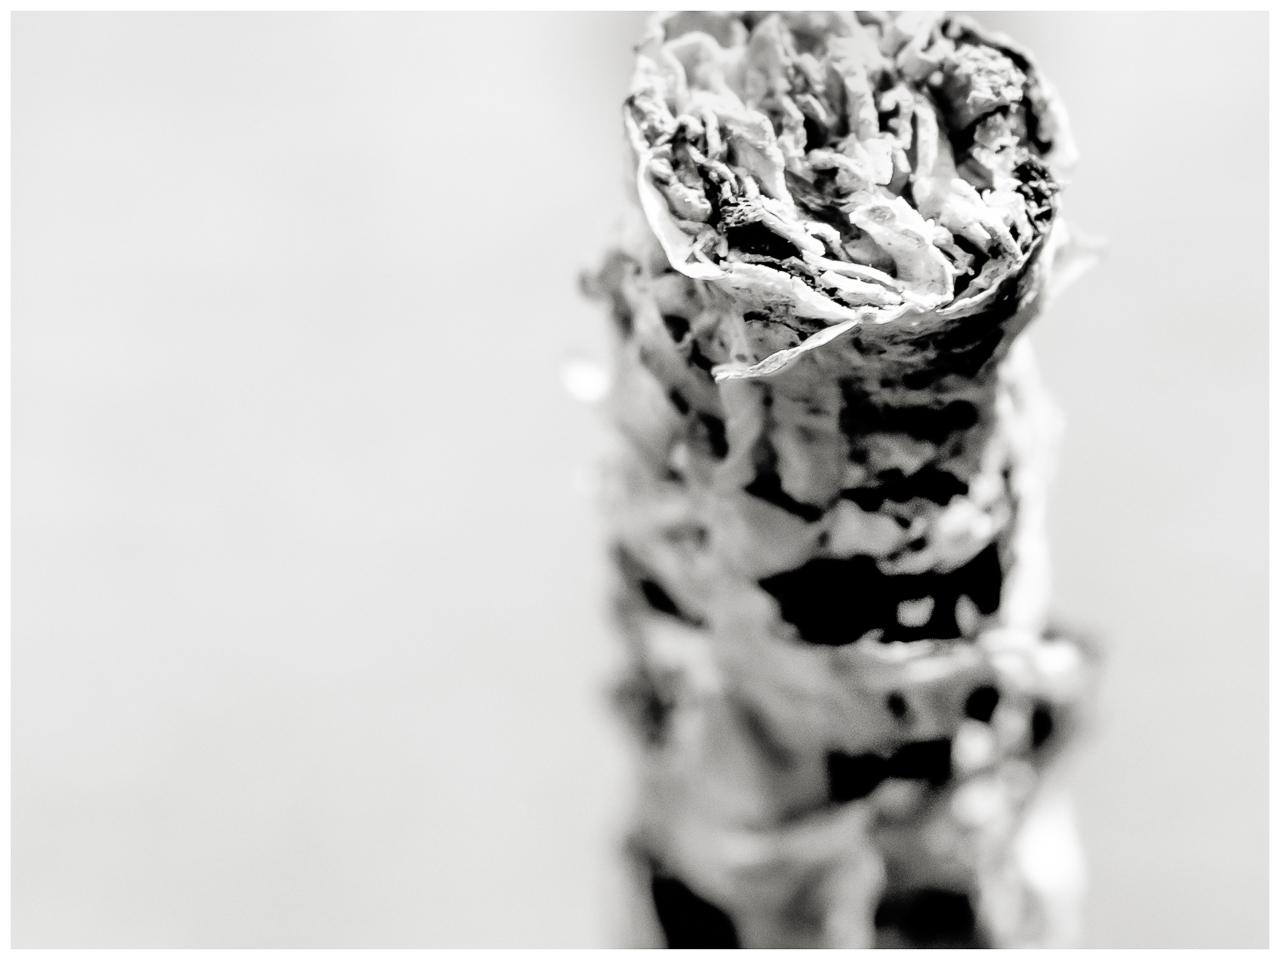 Archivum Secretum V: Wer raucht, sieht kaltblütig aus, Berlin 2018